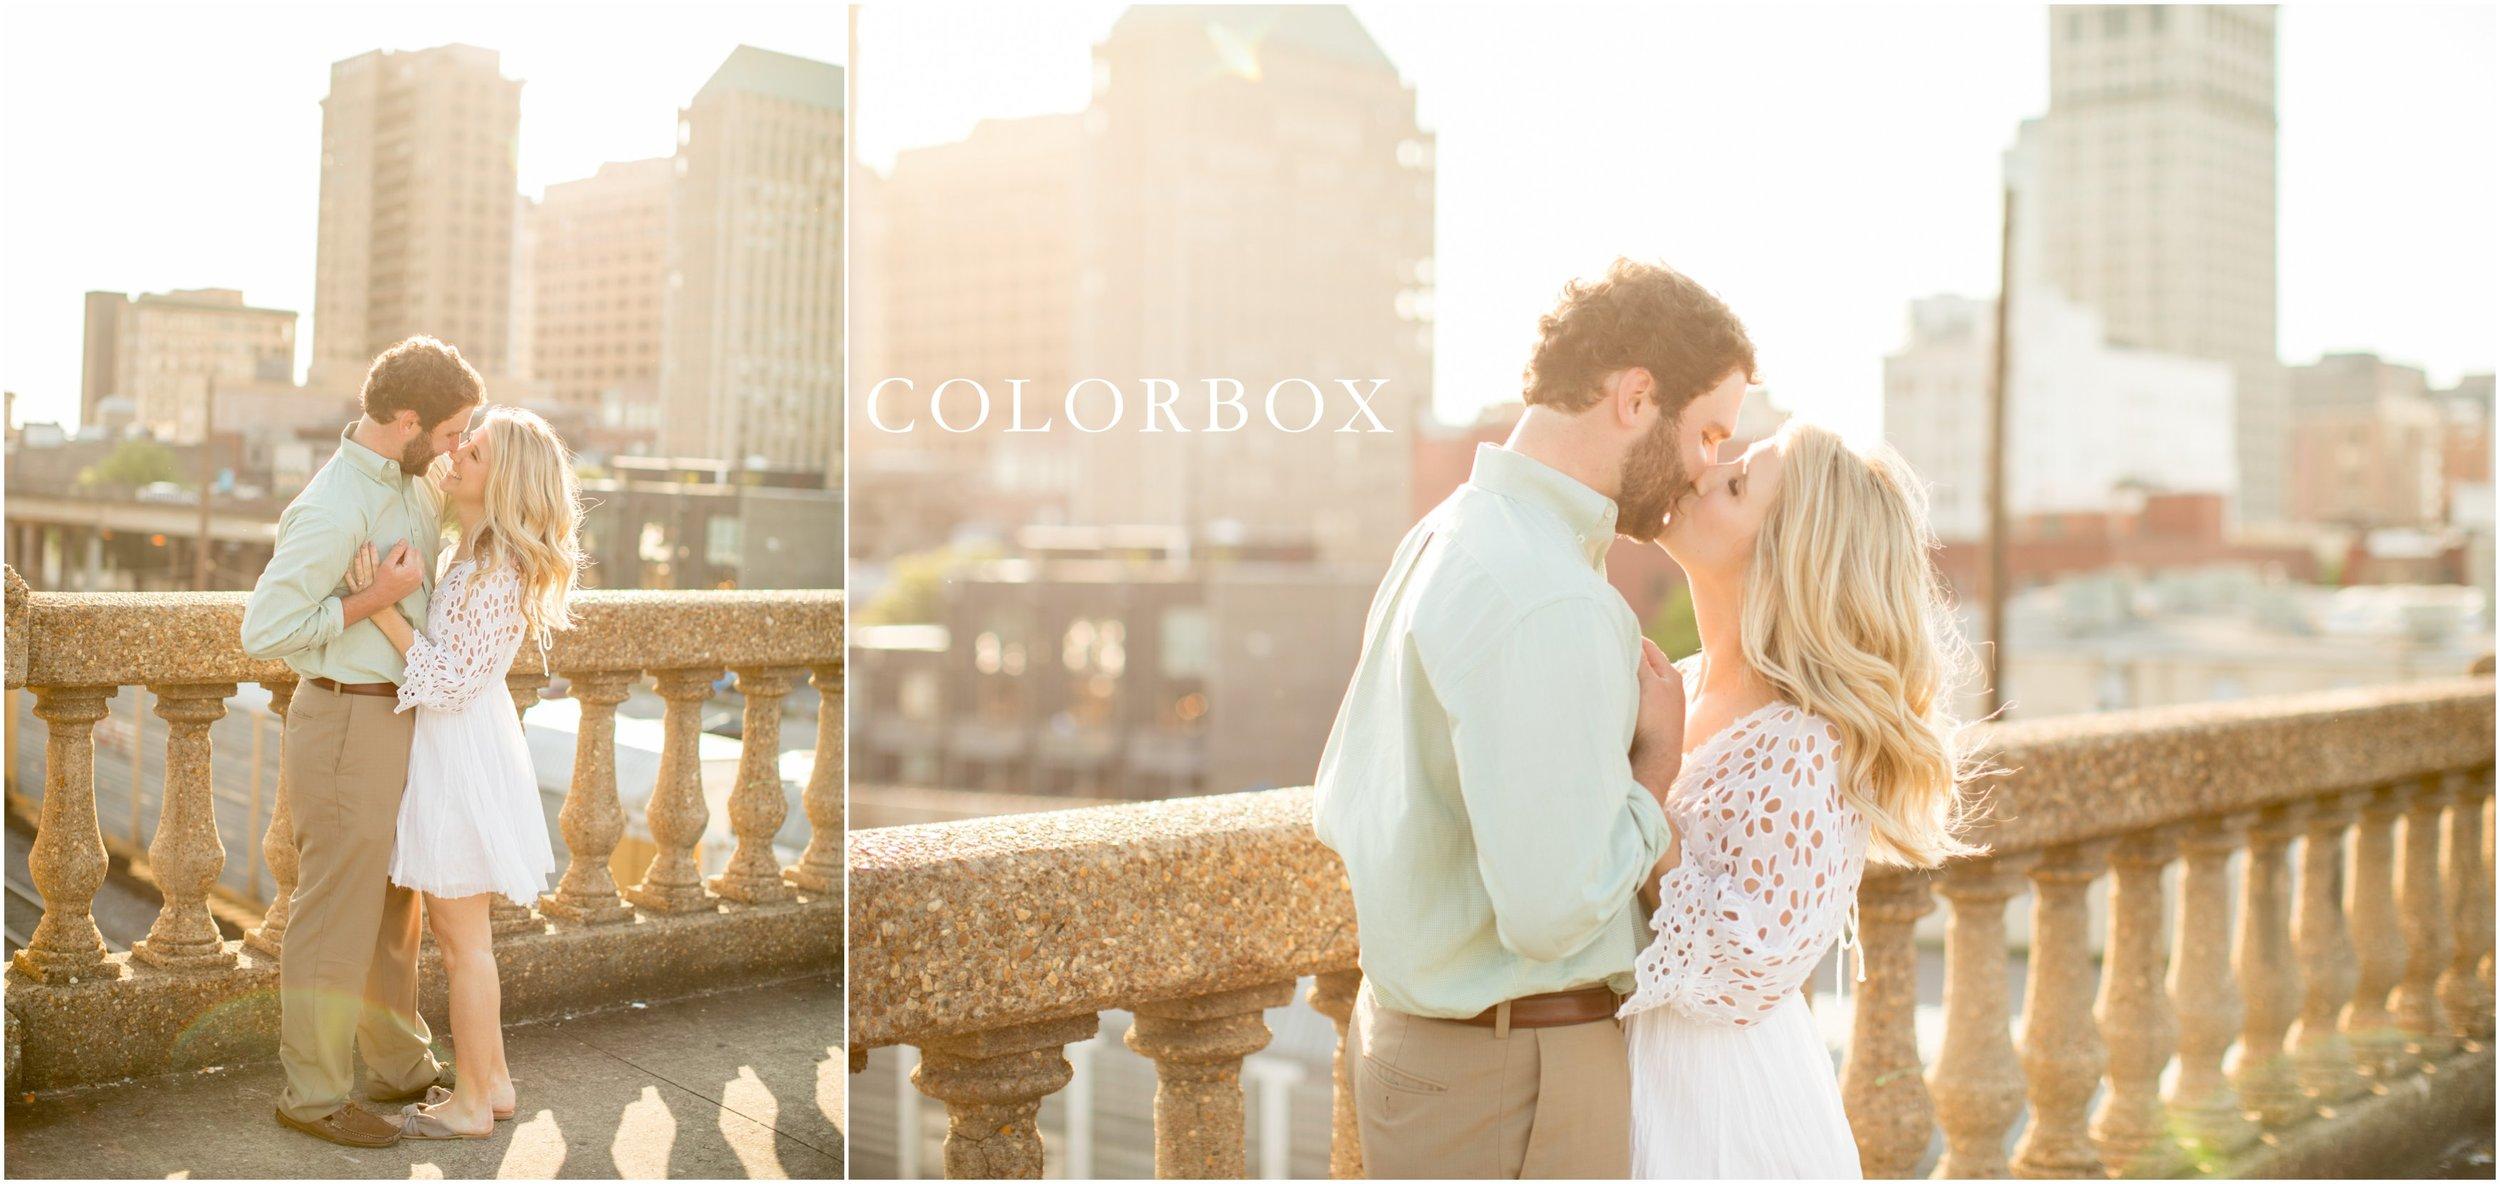 colorboxphotographers_5822.jpg